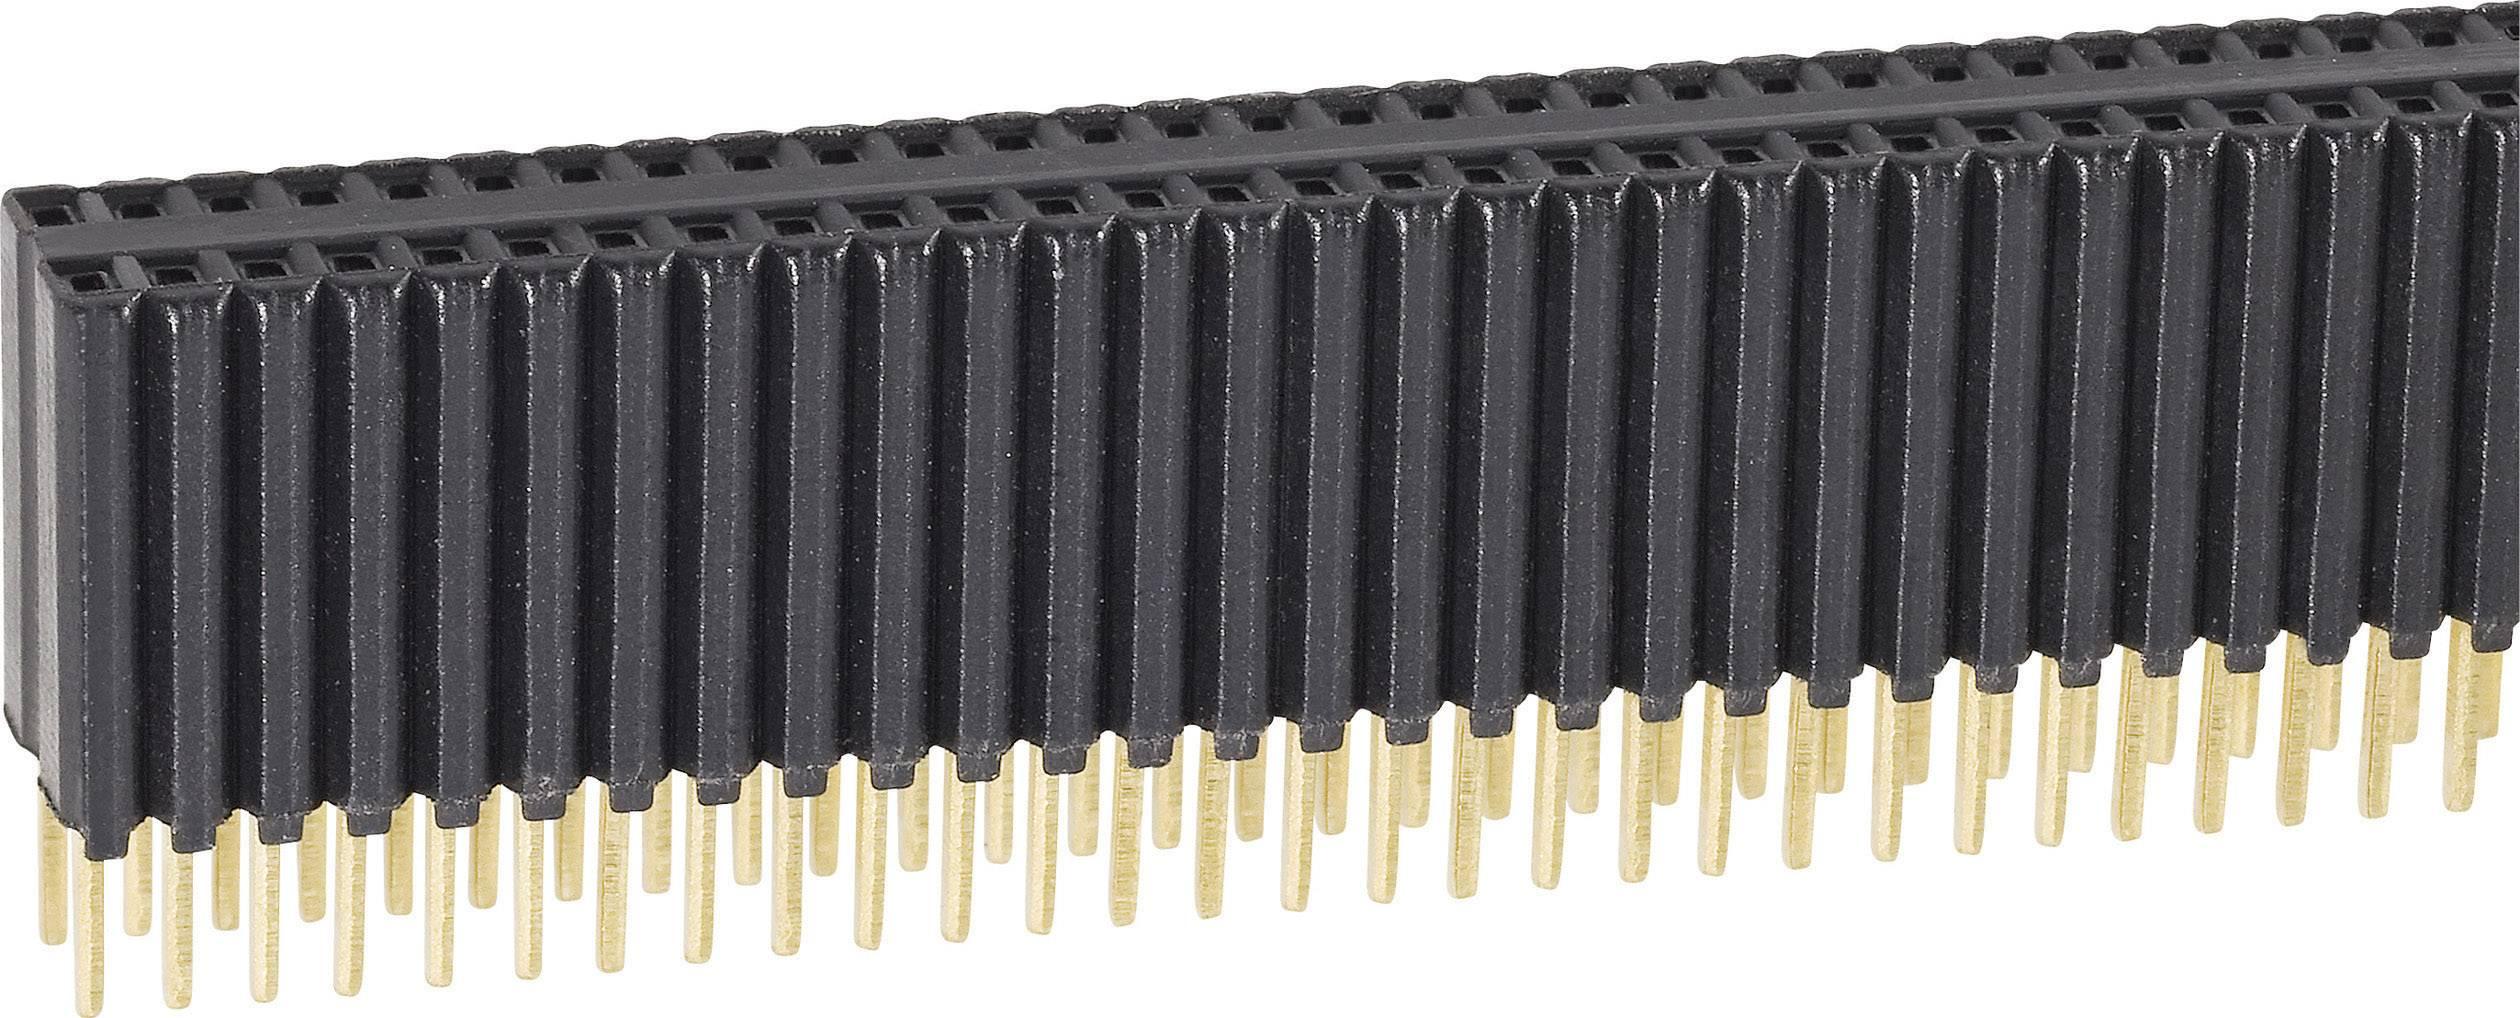 Zásuvková lišta Fischer Elektronik BLM KG 2/ 72/G, řádky 2, kontakty na řádek 36, 1 ks